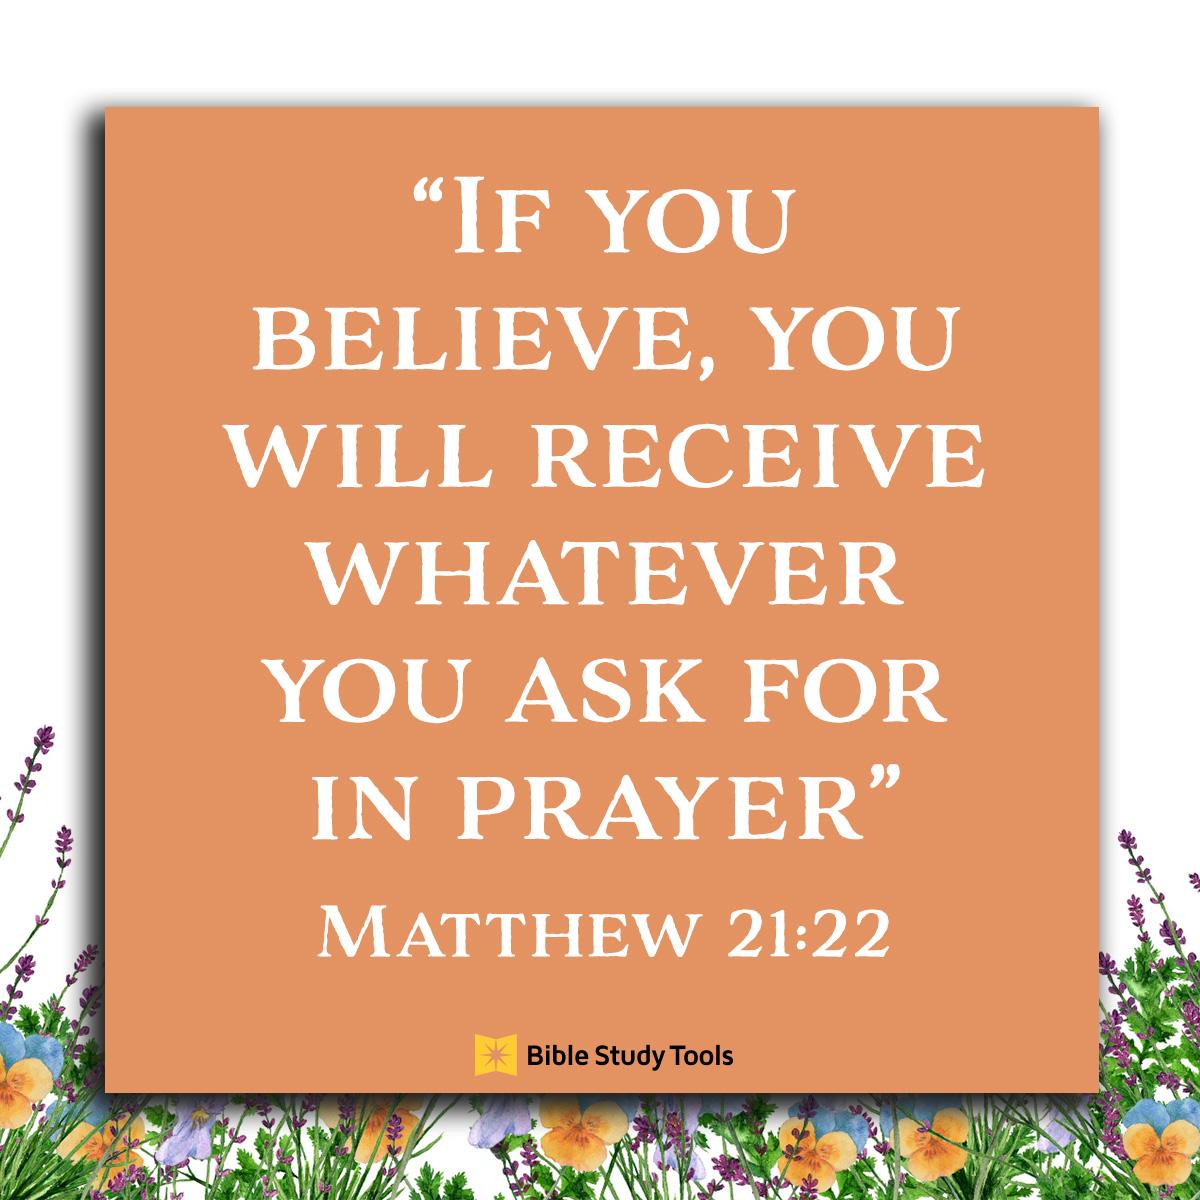 Matthew 21:22, inspirational image